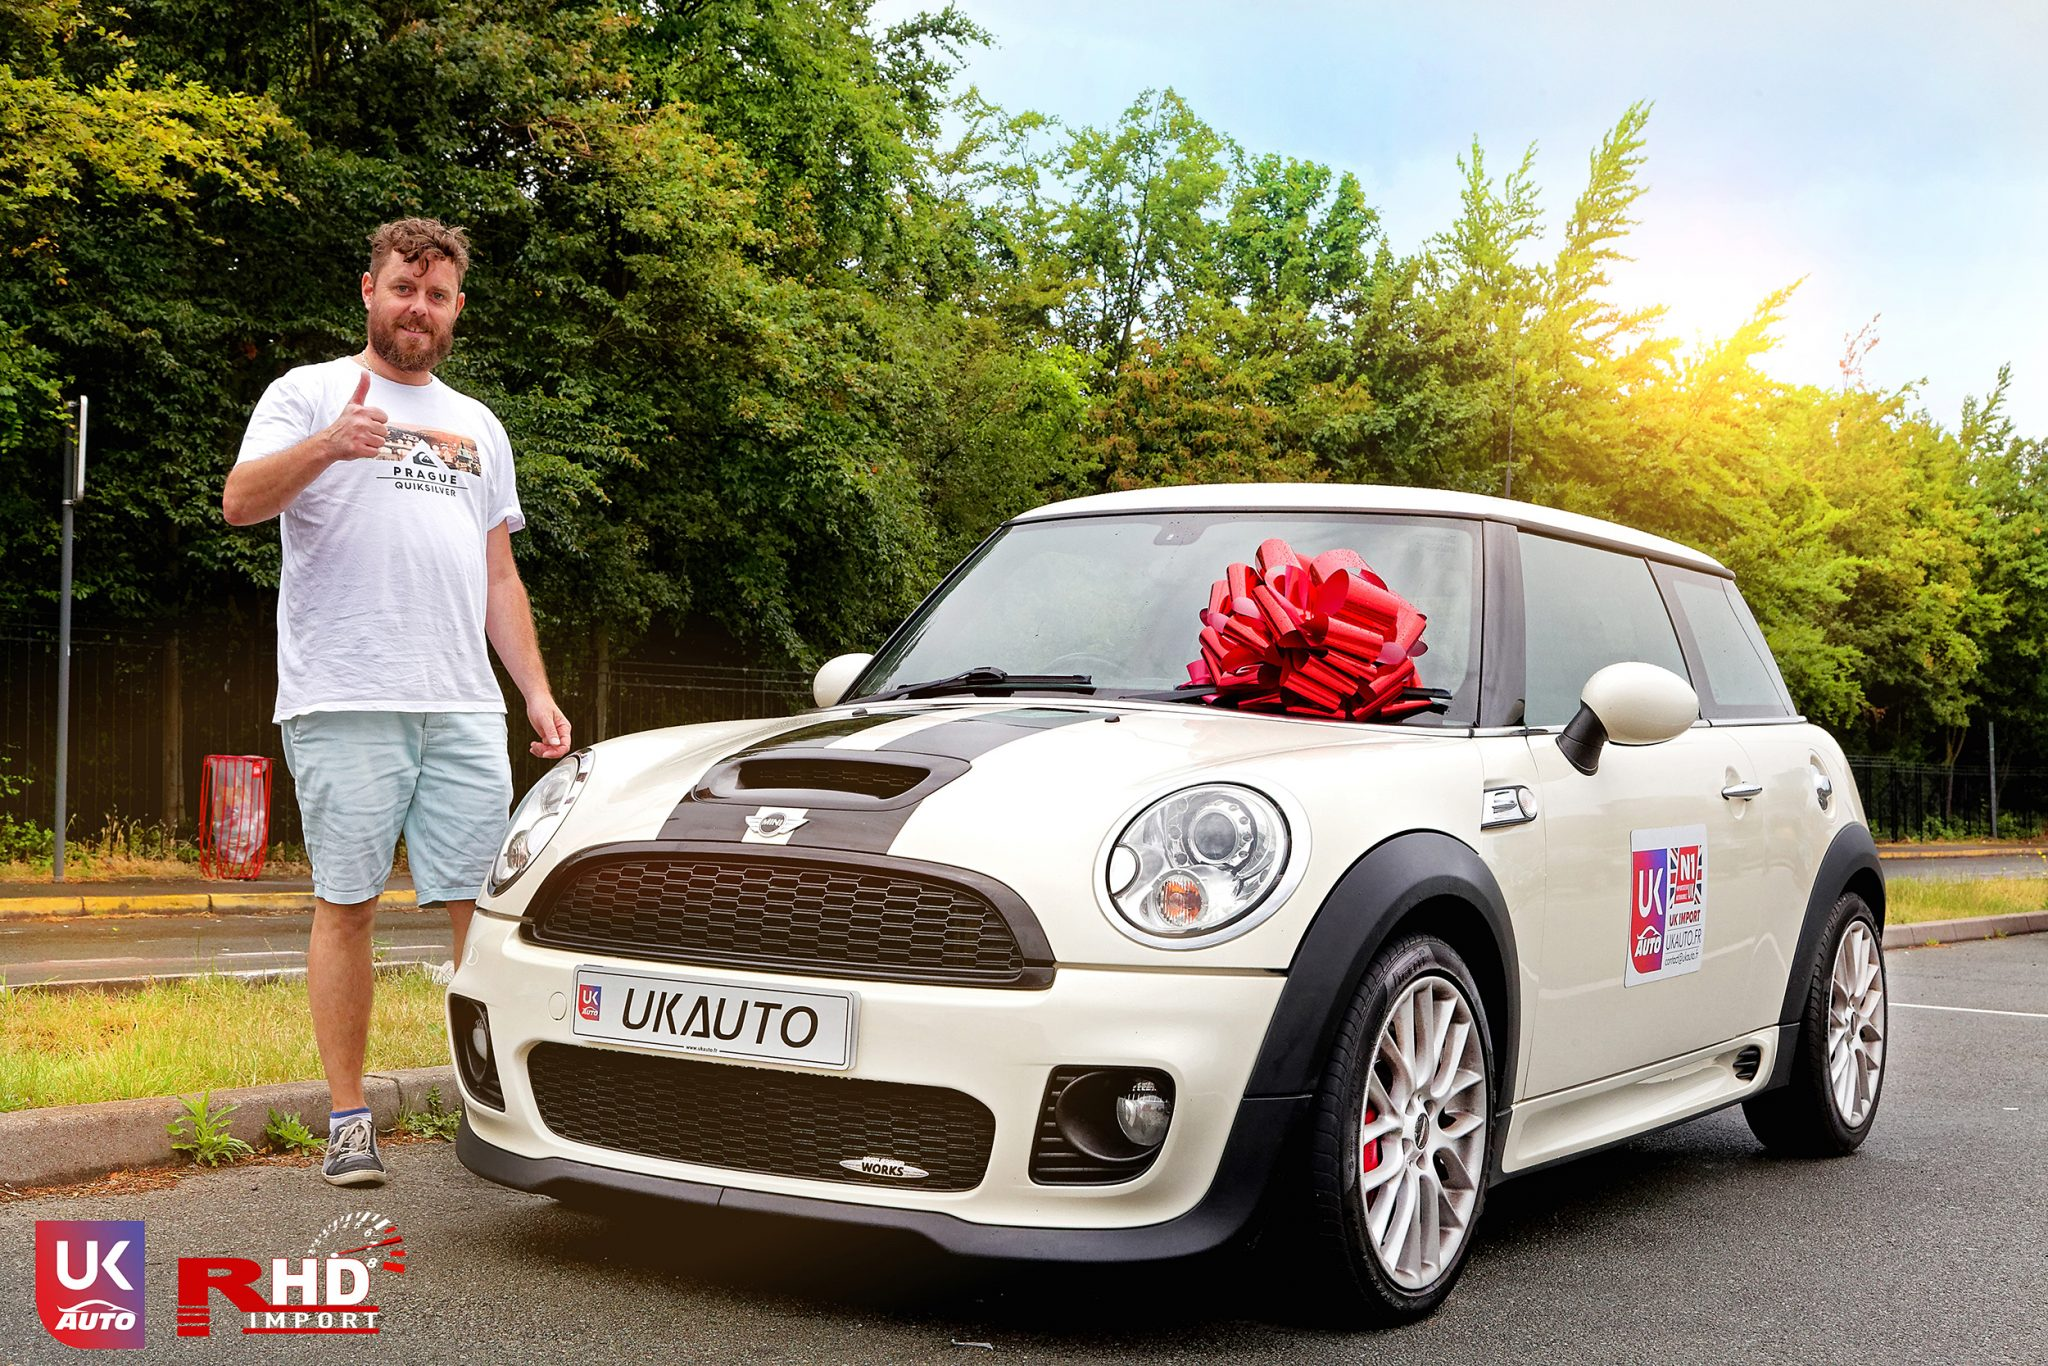 IMG 7269 DxO - Felicitation a Antoine Mini Cooper JCW John Cooper Works R56 voiture d'occasion en Angleterre